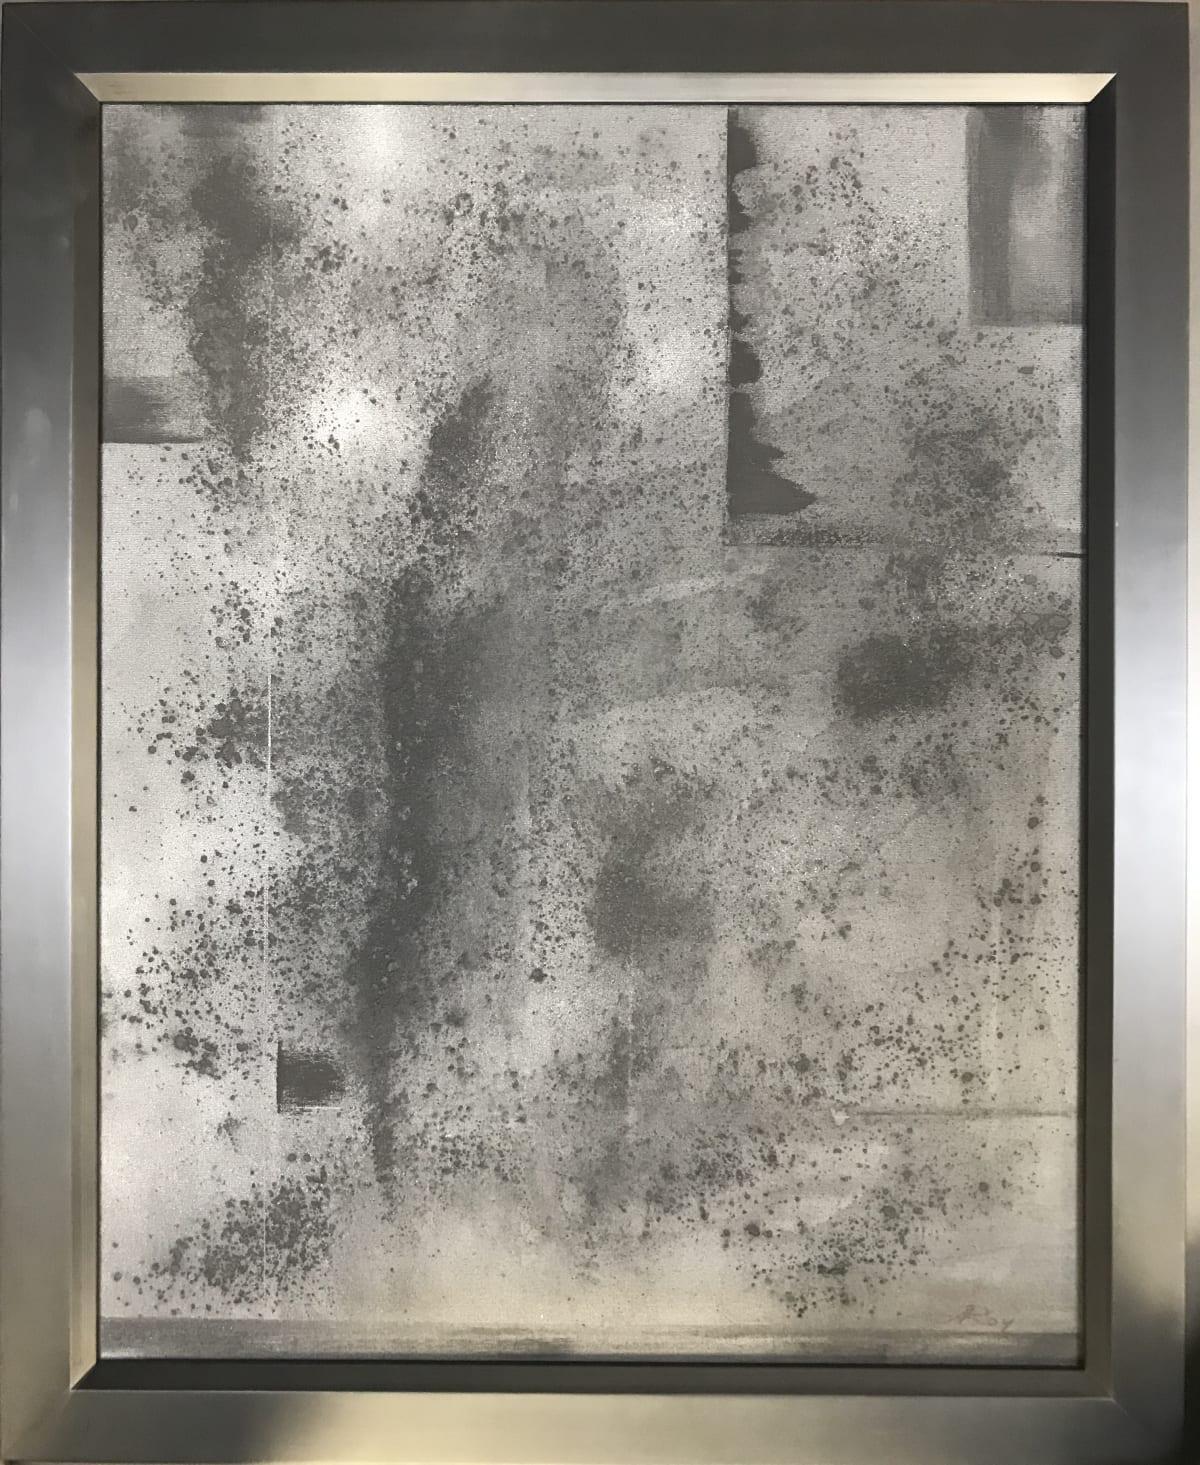 Alvin Roy The Deluge Graphite on Canvas 22 x 28